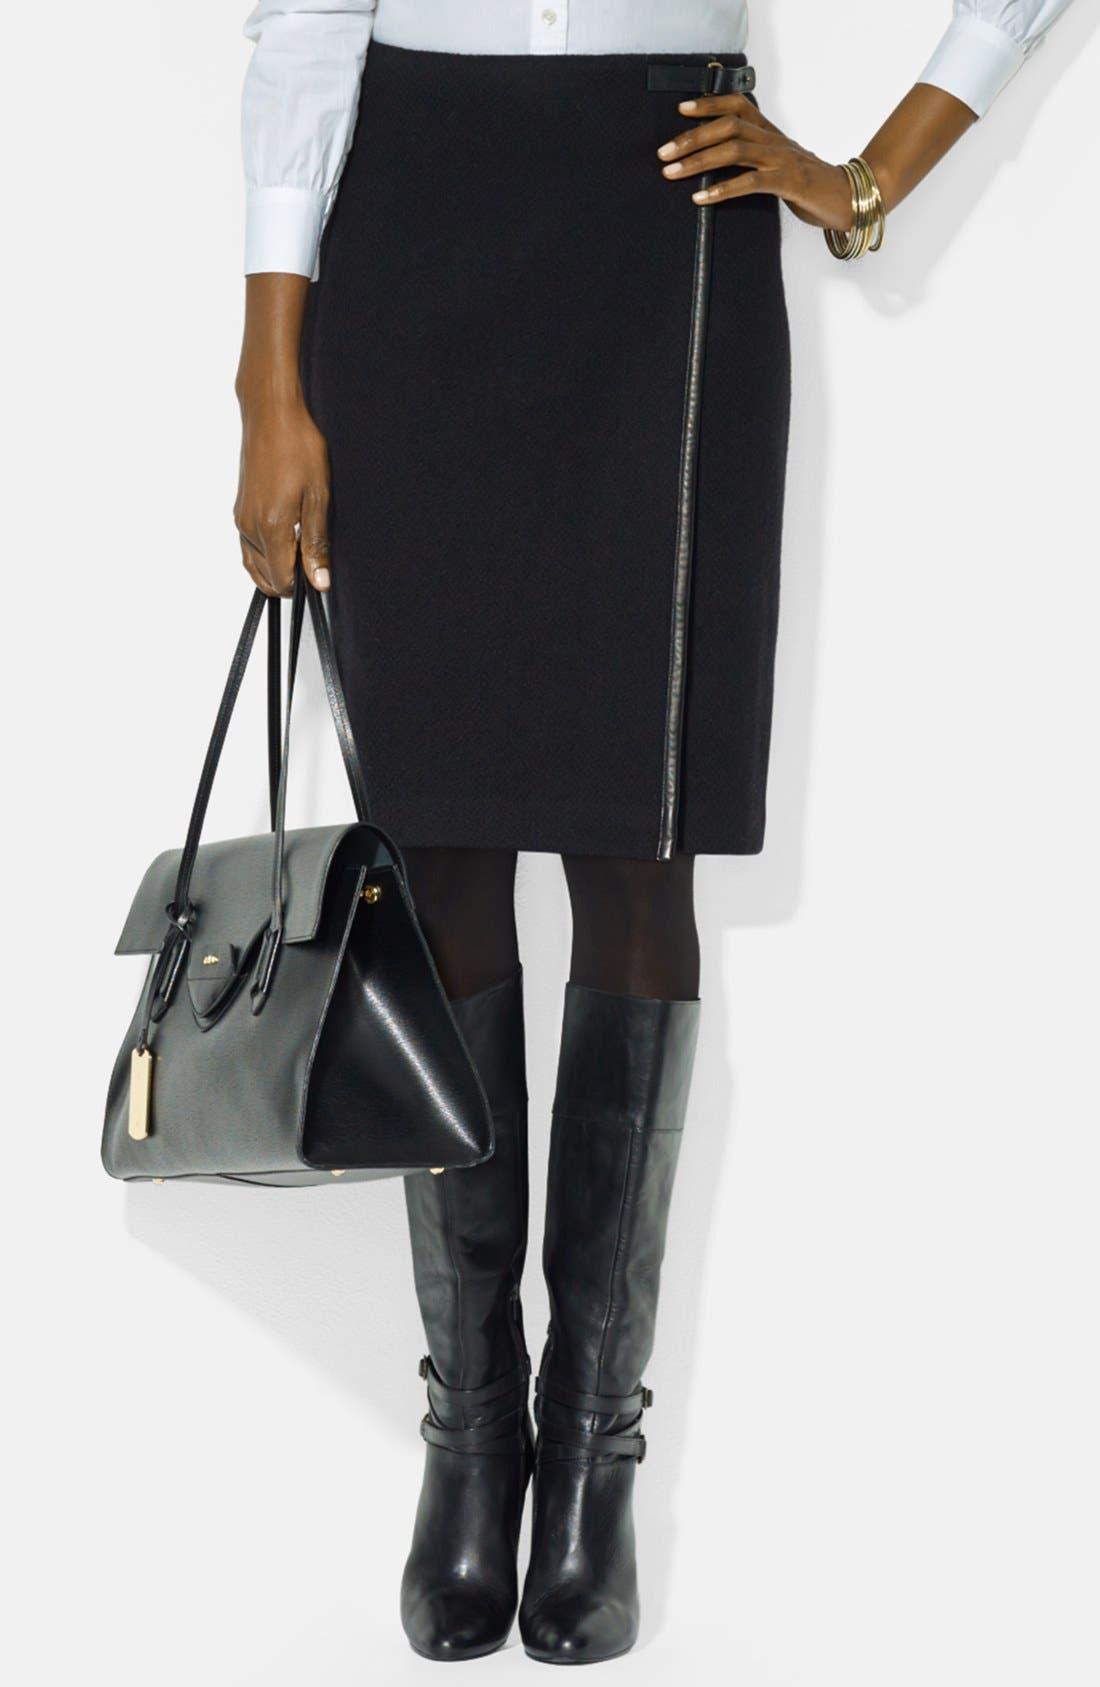 Alternate Image 1 Selected - Lauren Ralph Lauren Leather Trim Pencil Skirt (Petite)